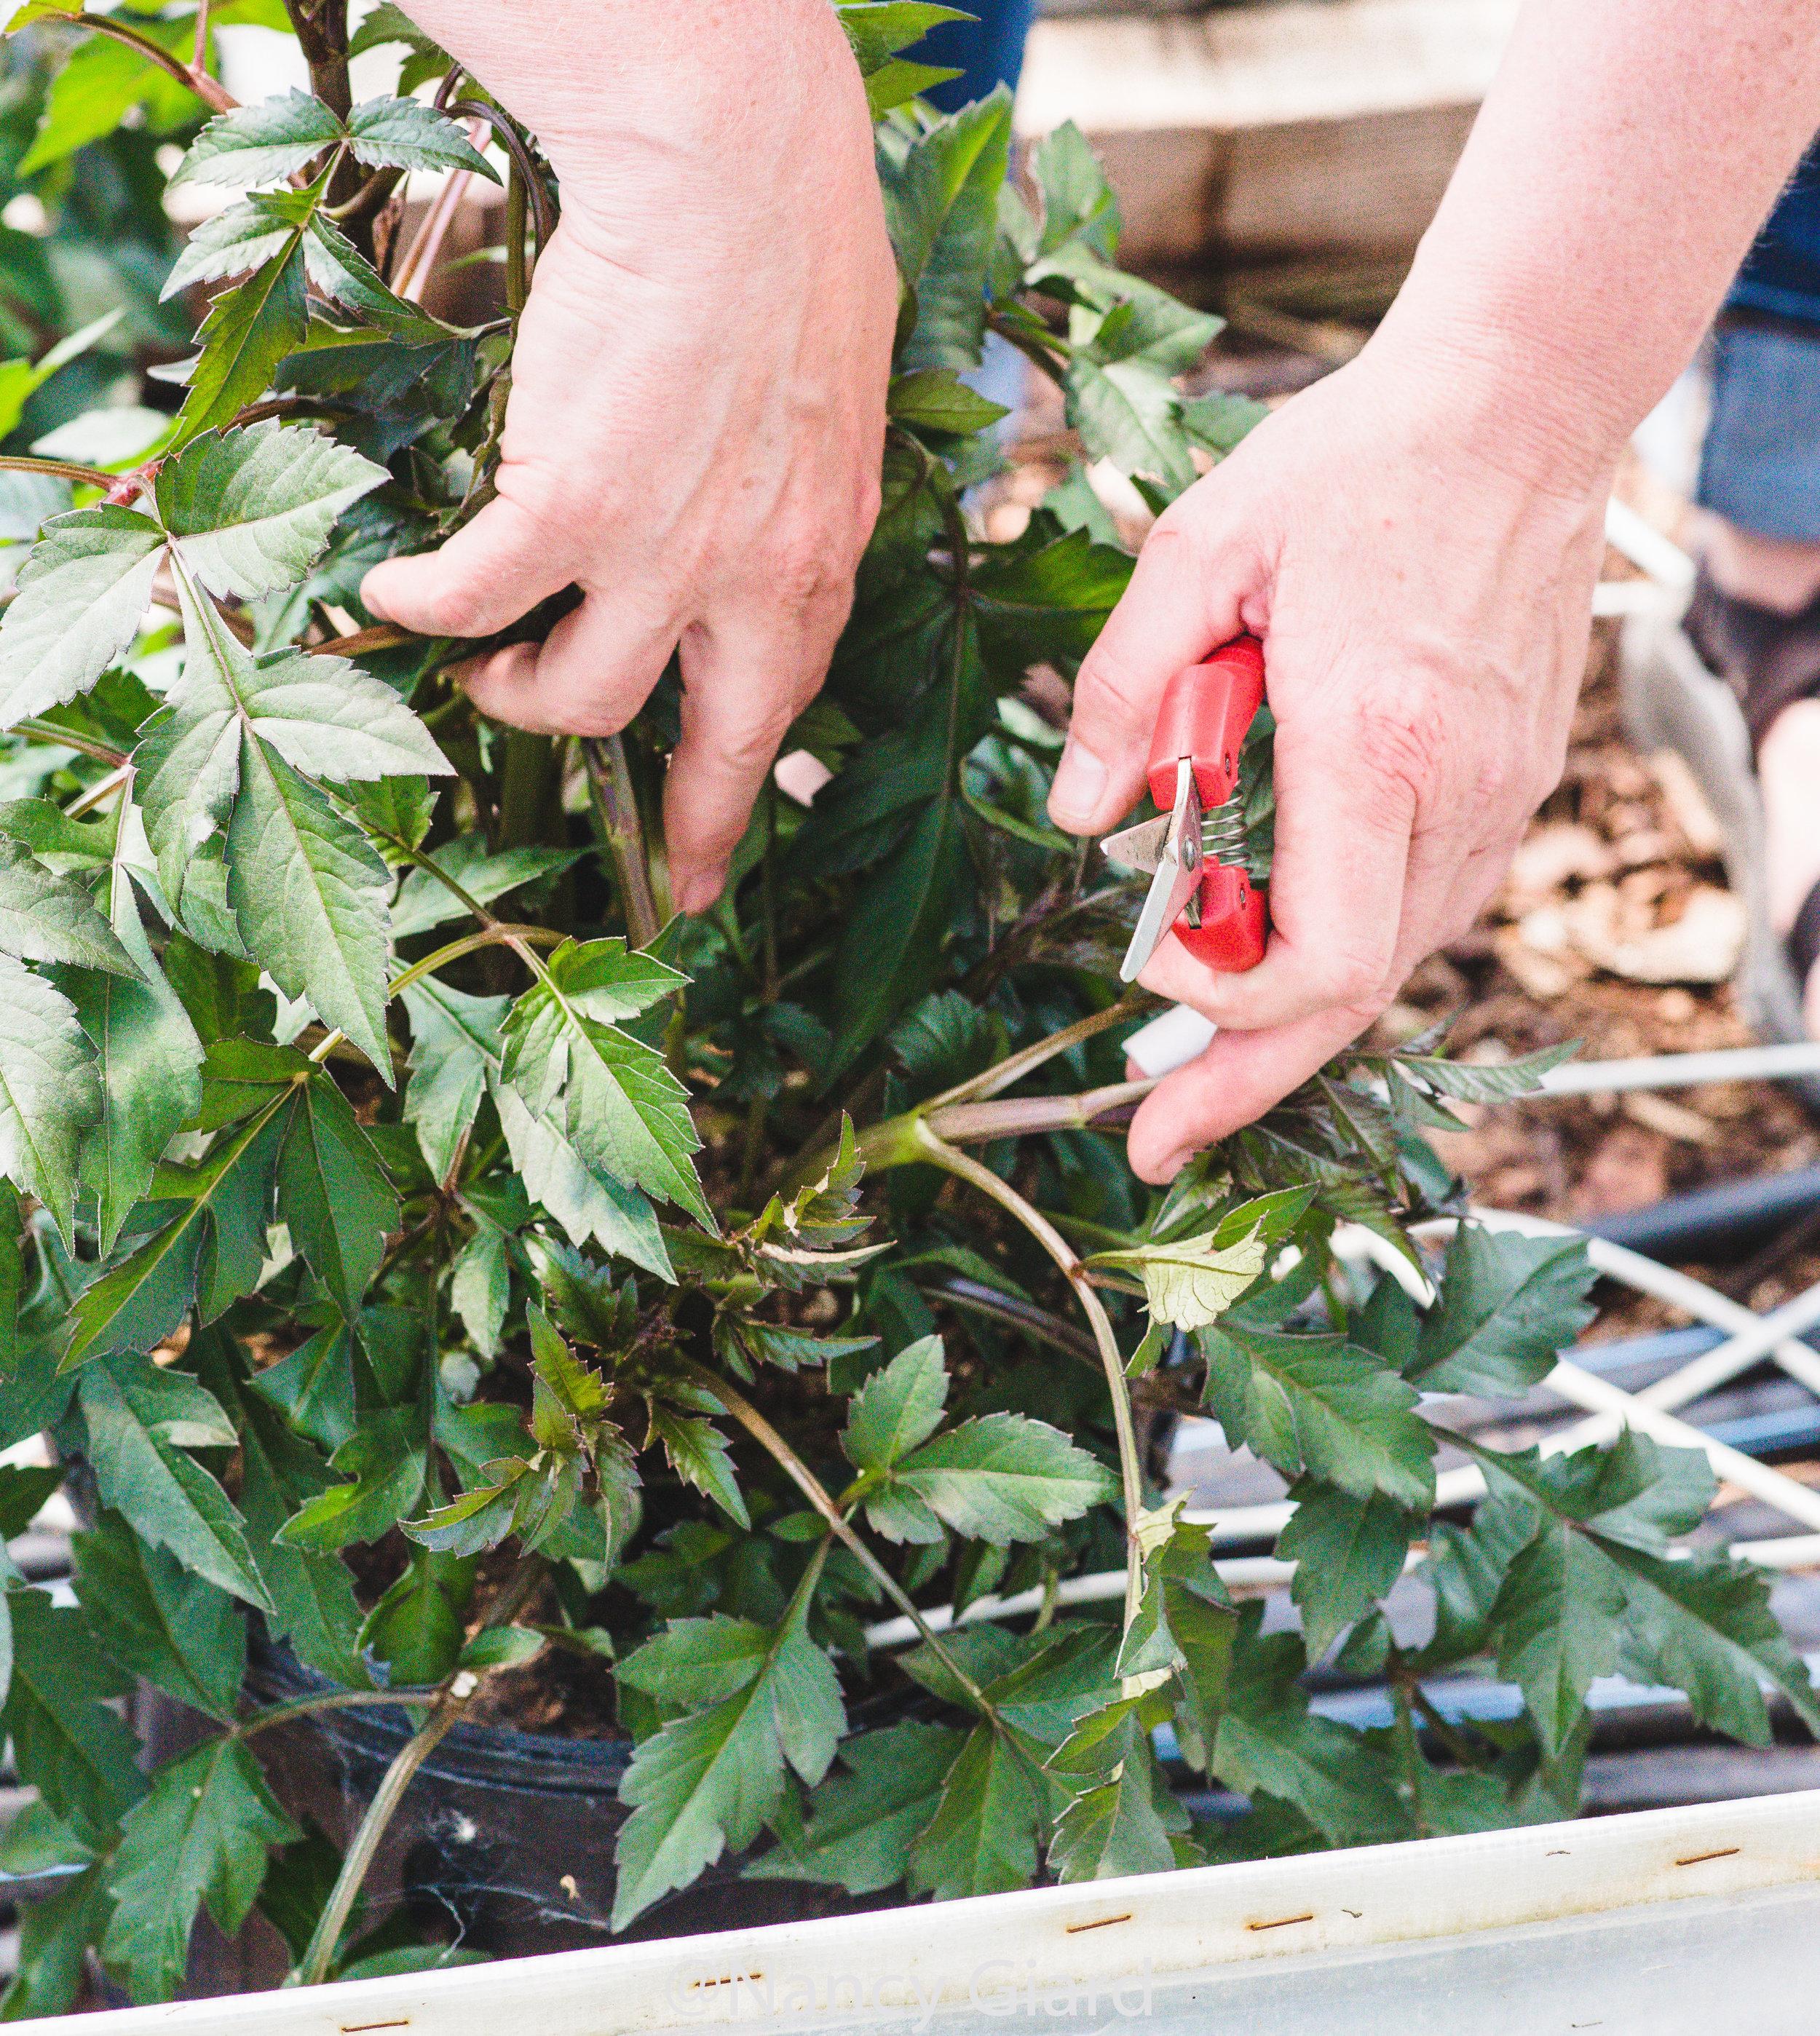 Pruning dahlias in early June.